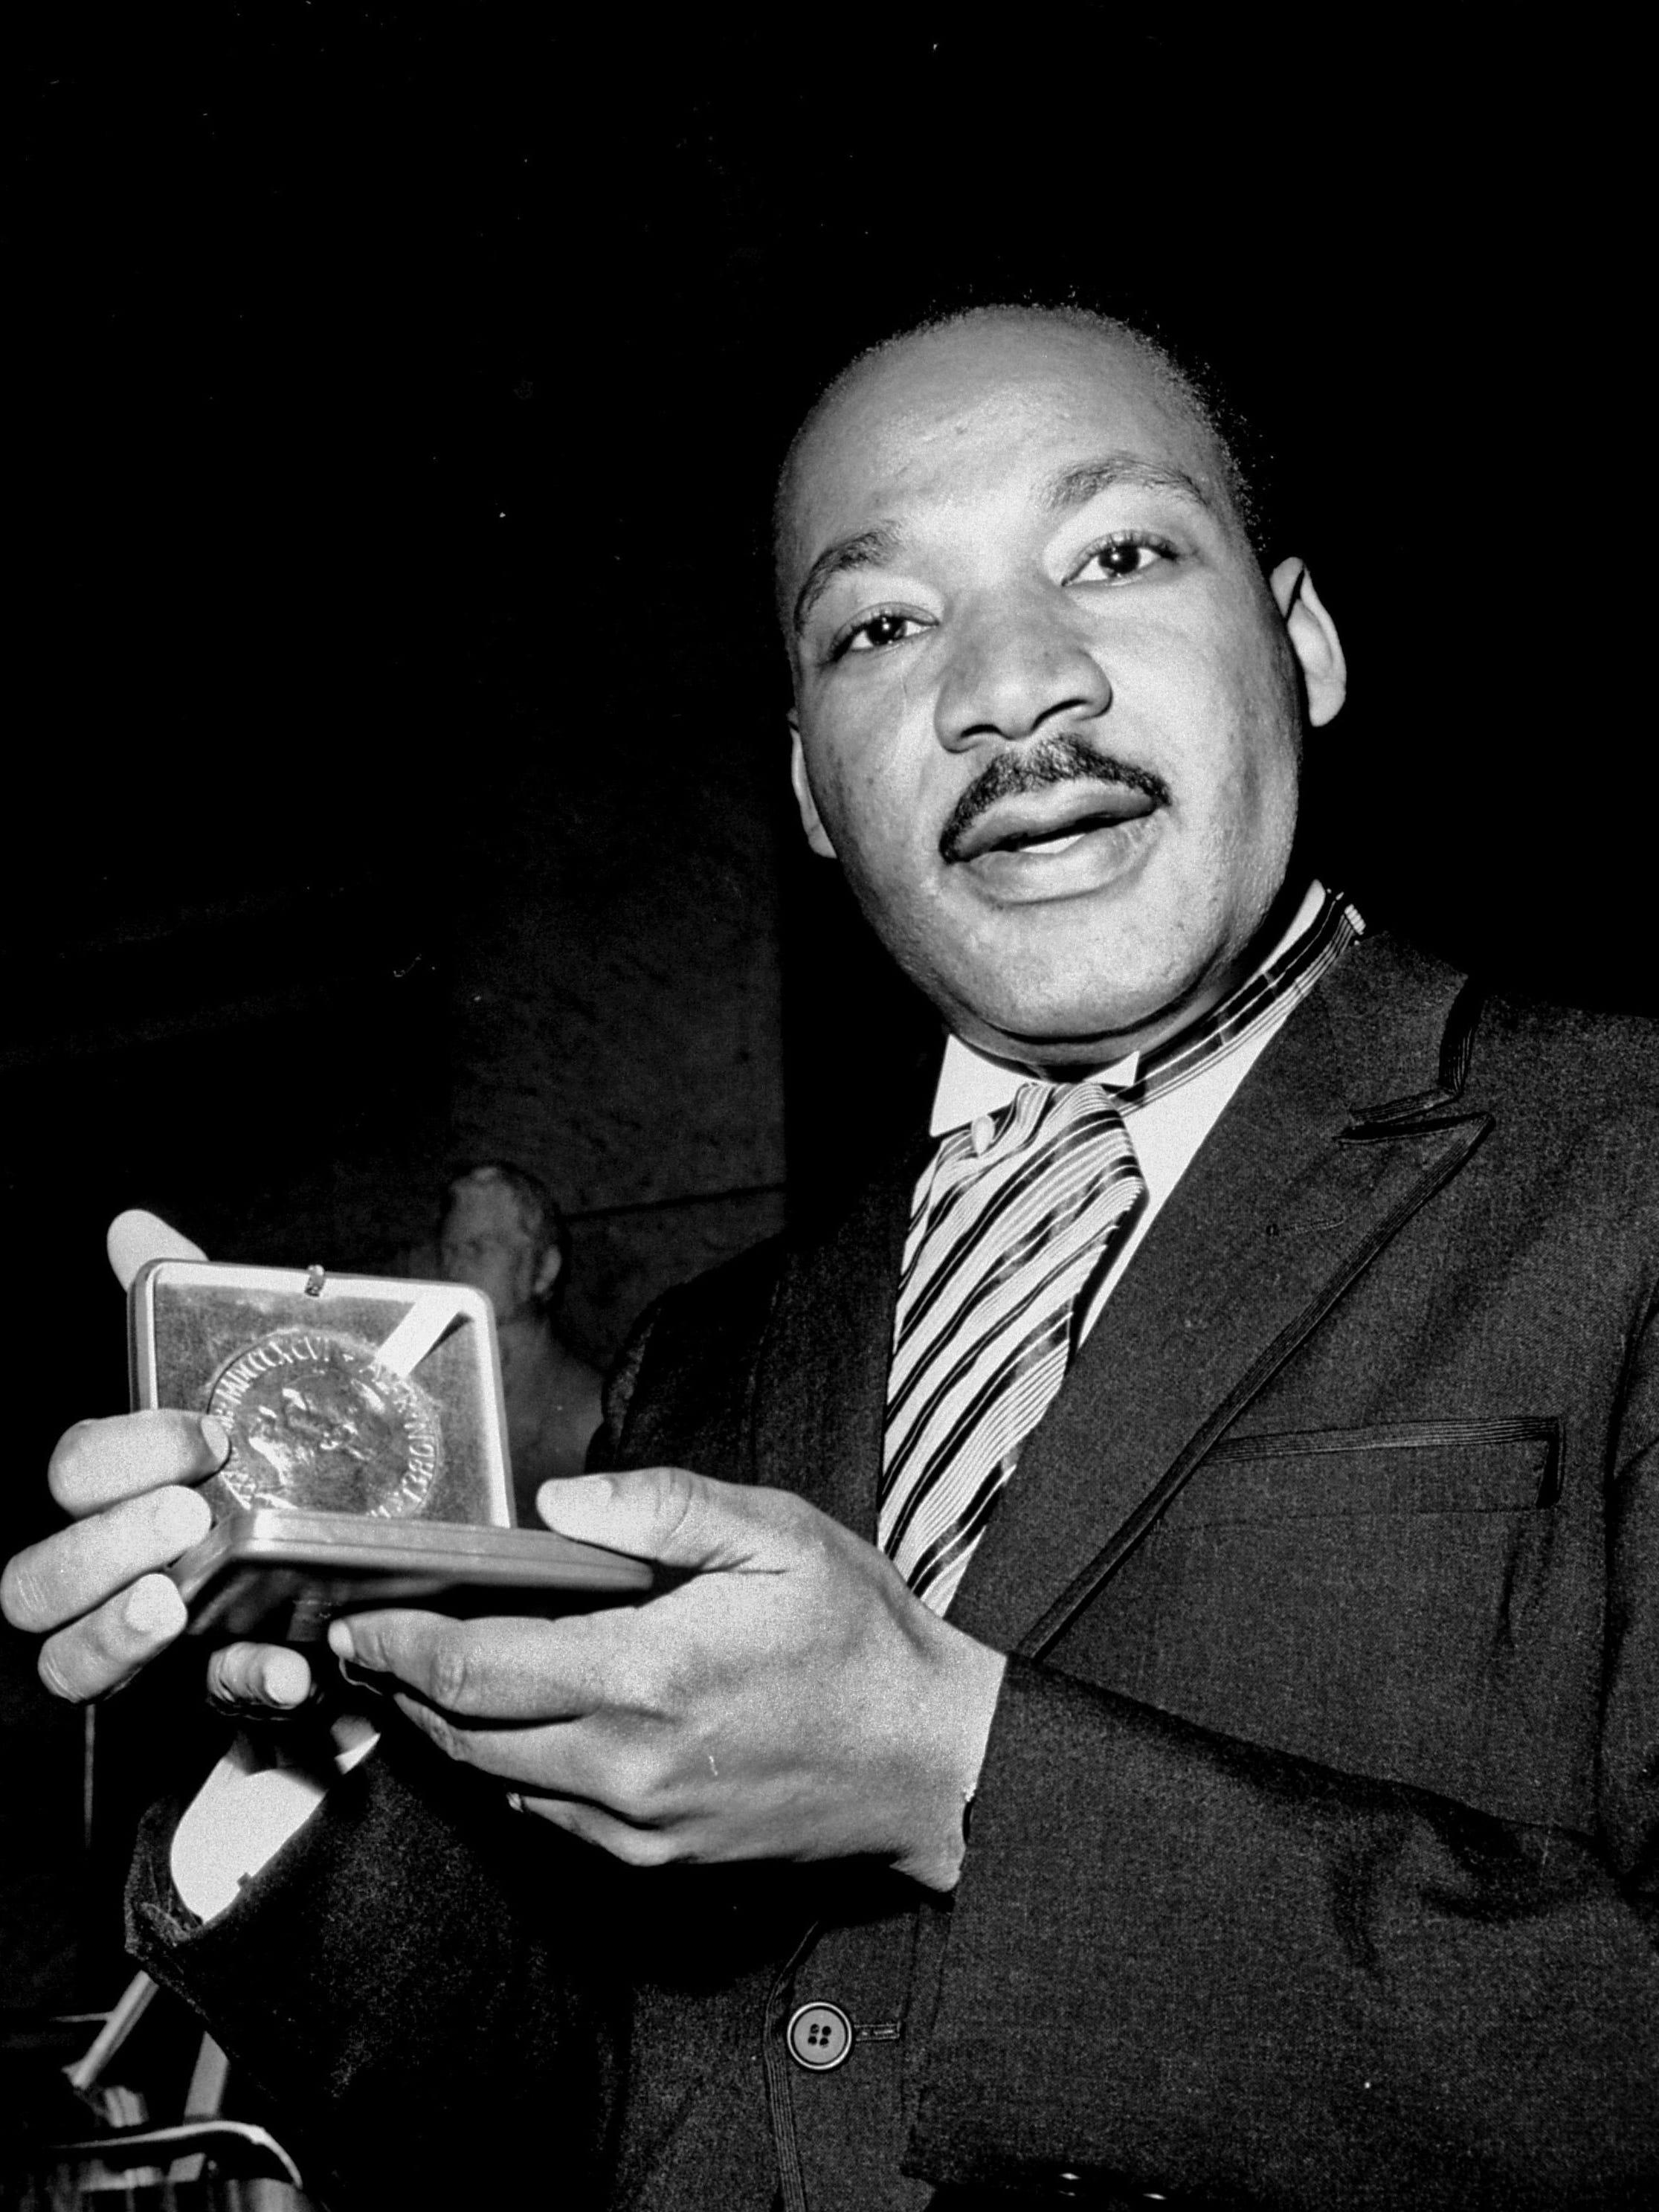 Read Martin Luther King Jr S Inspiring Nobel Peace Prize Speech